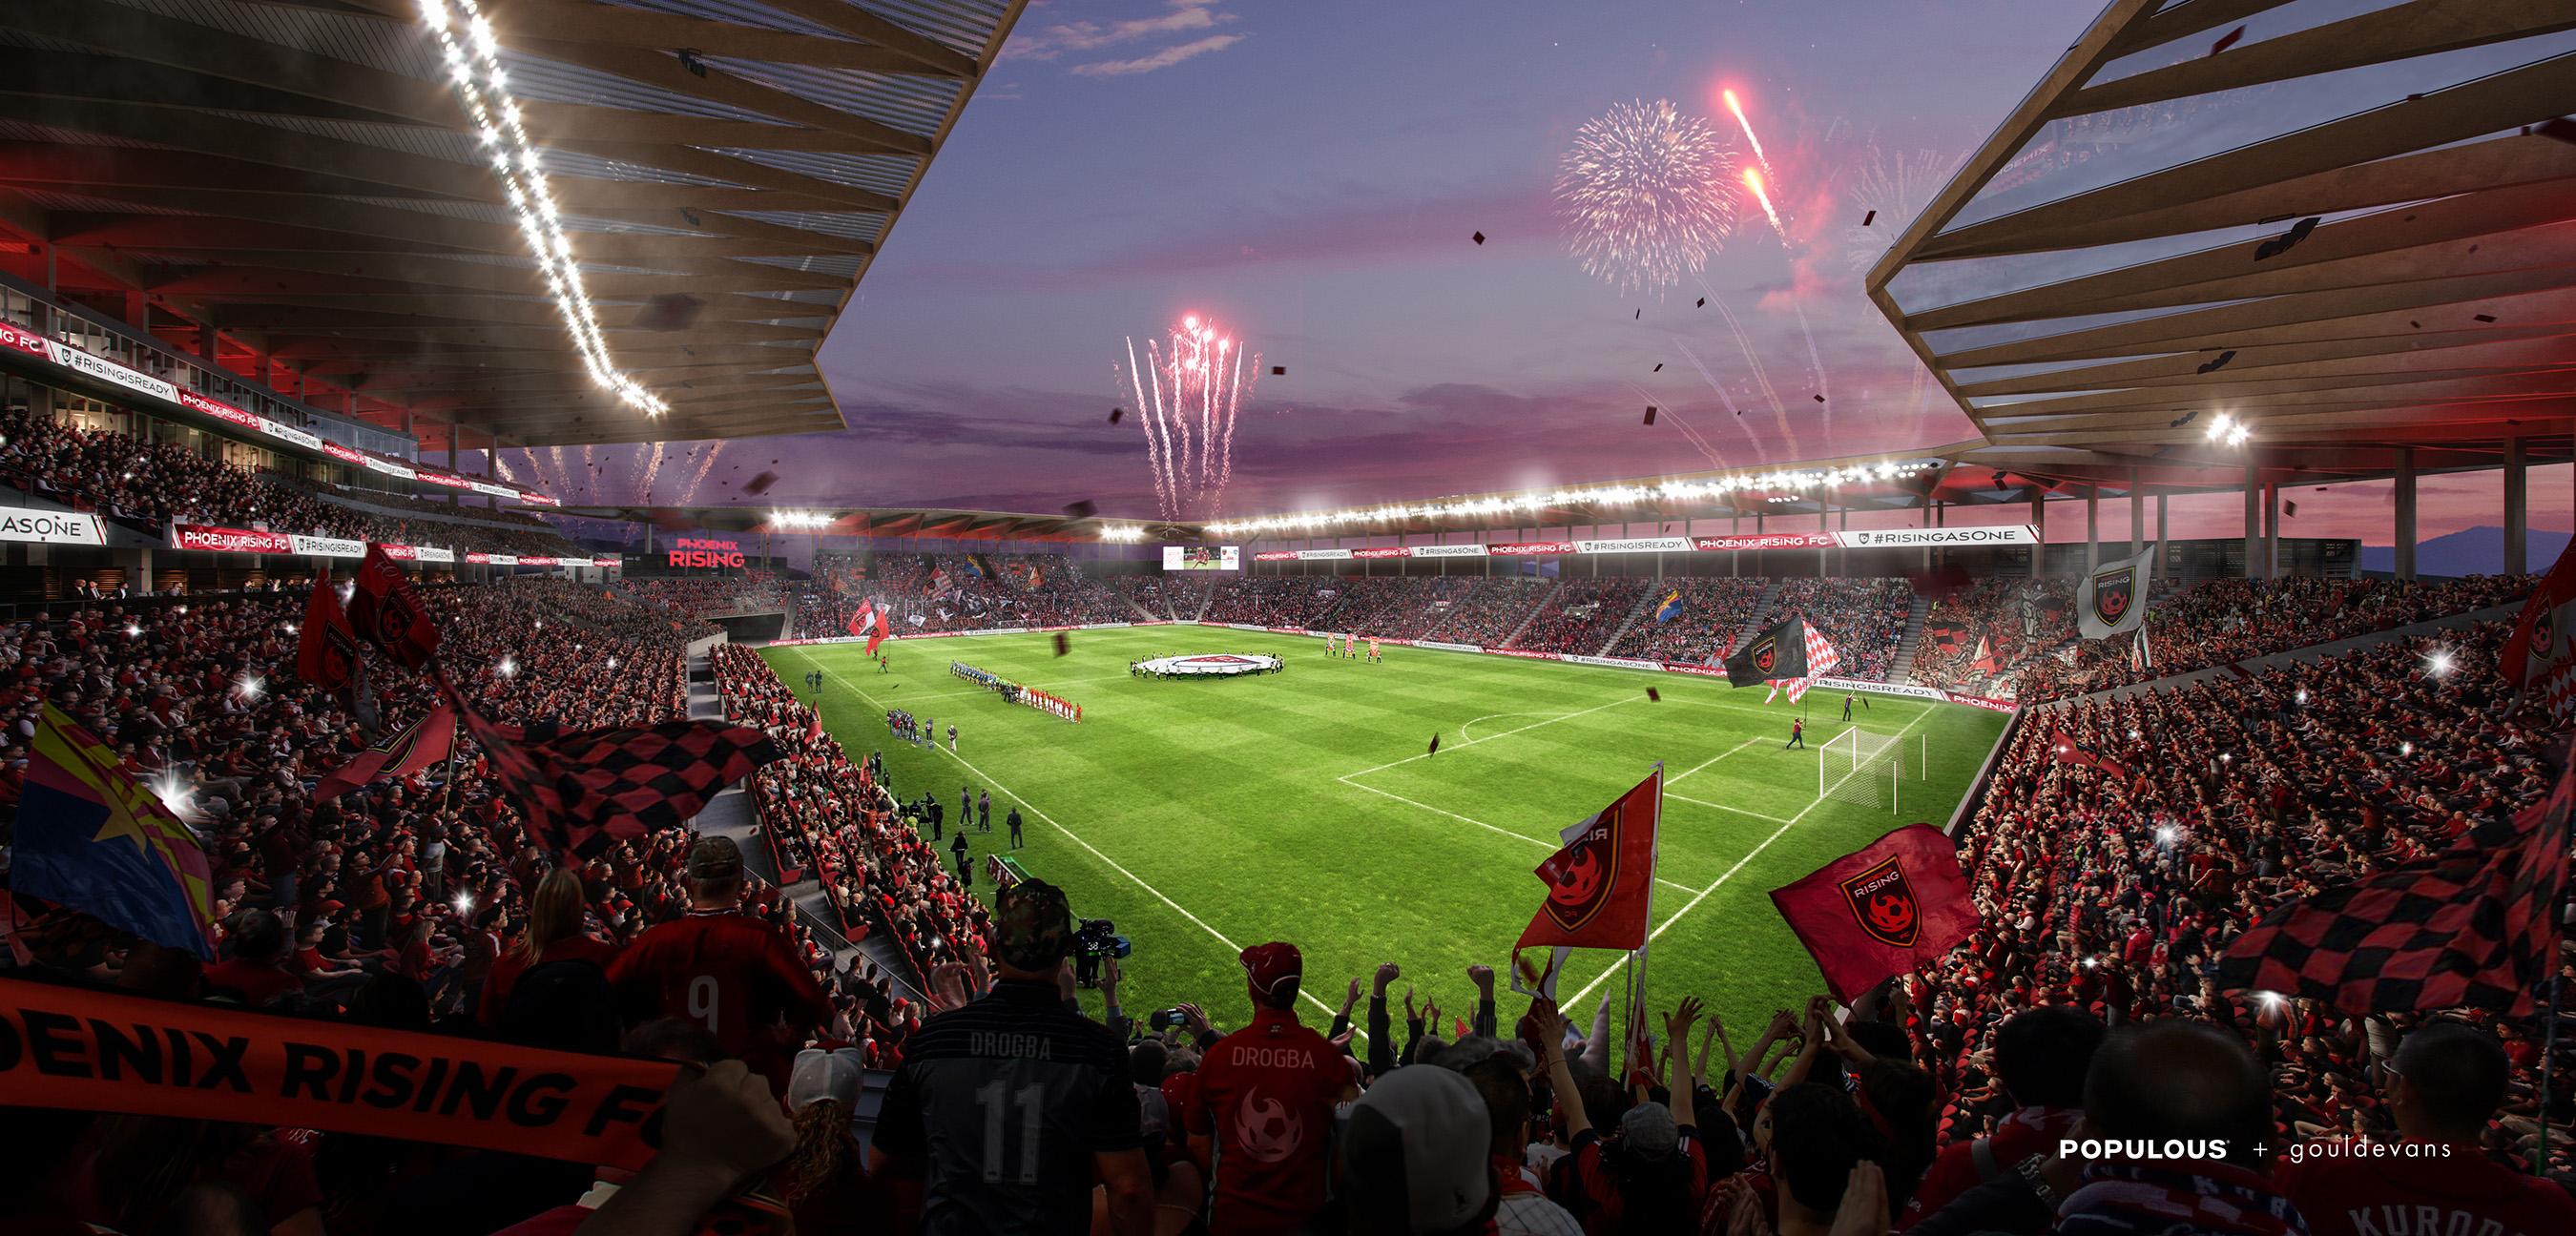 Phoenix Rising Football Club Offers Sneak Peak of Proposed Major League Soccer Stadium